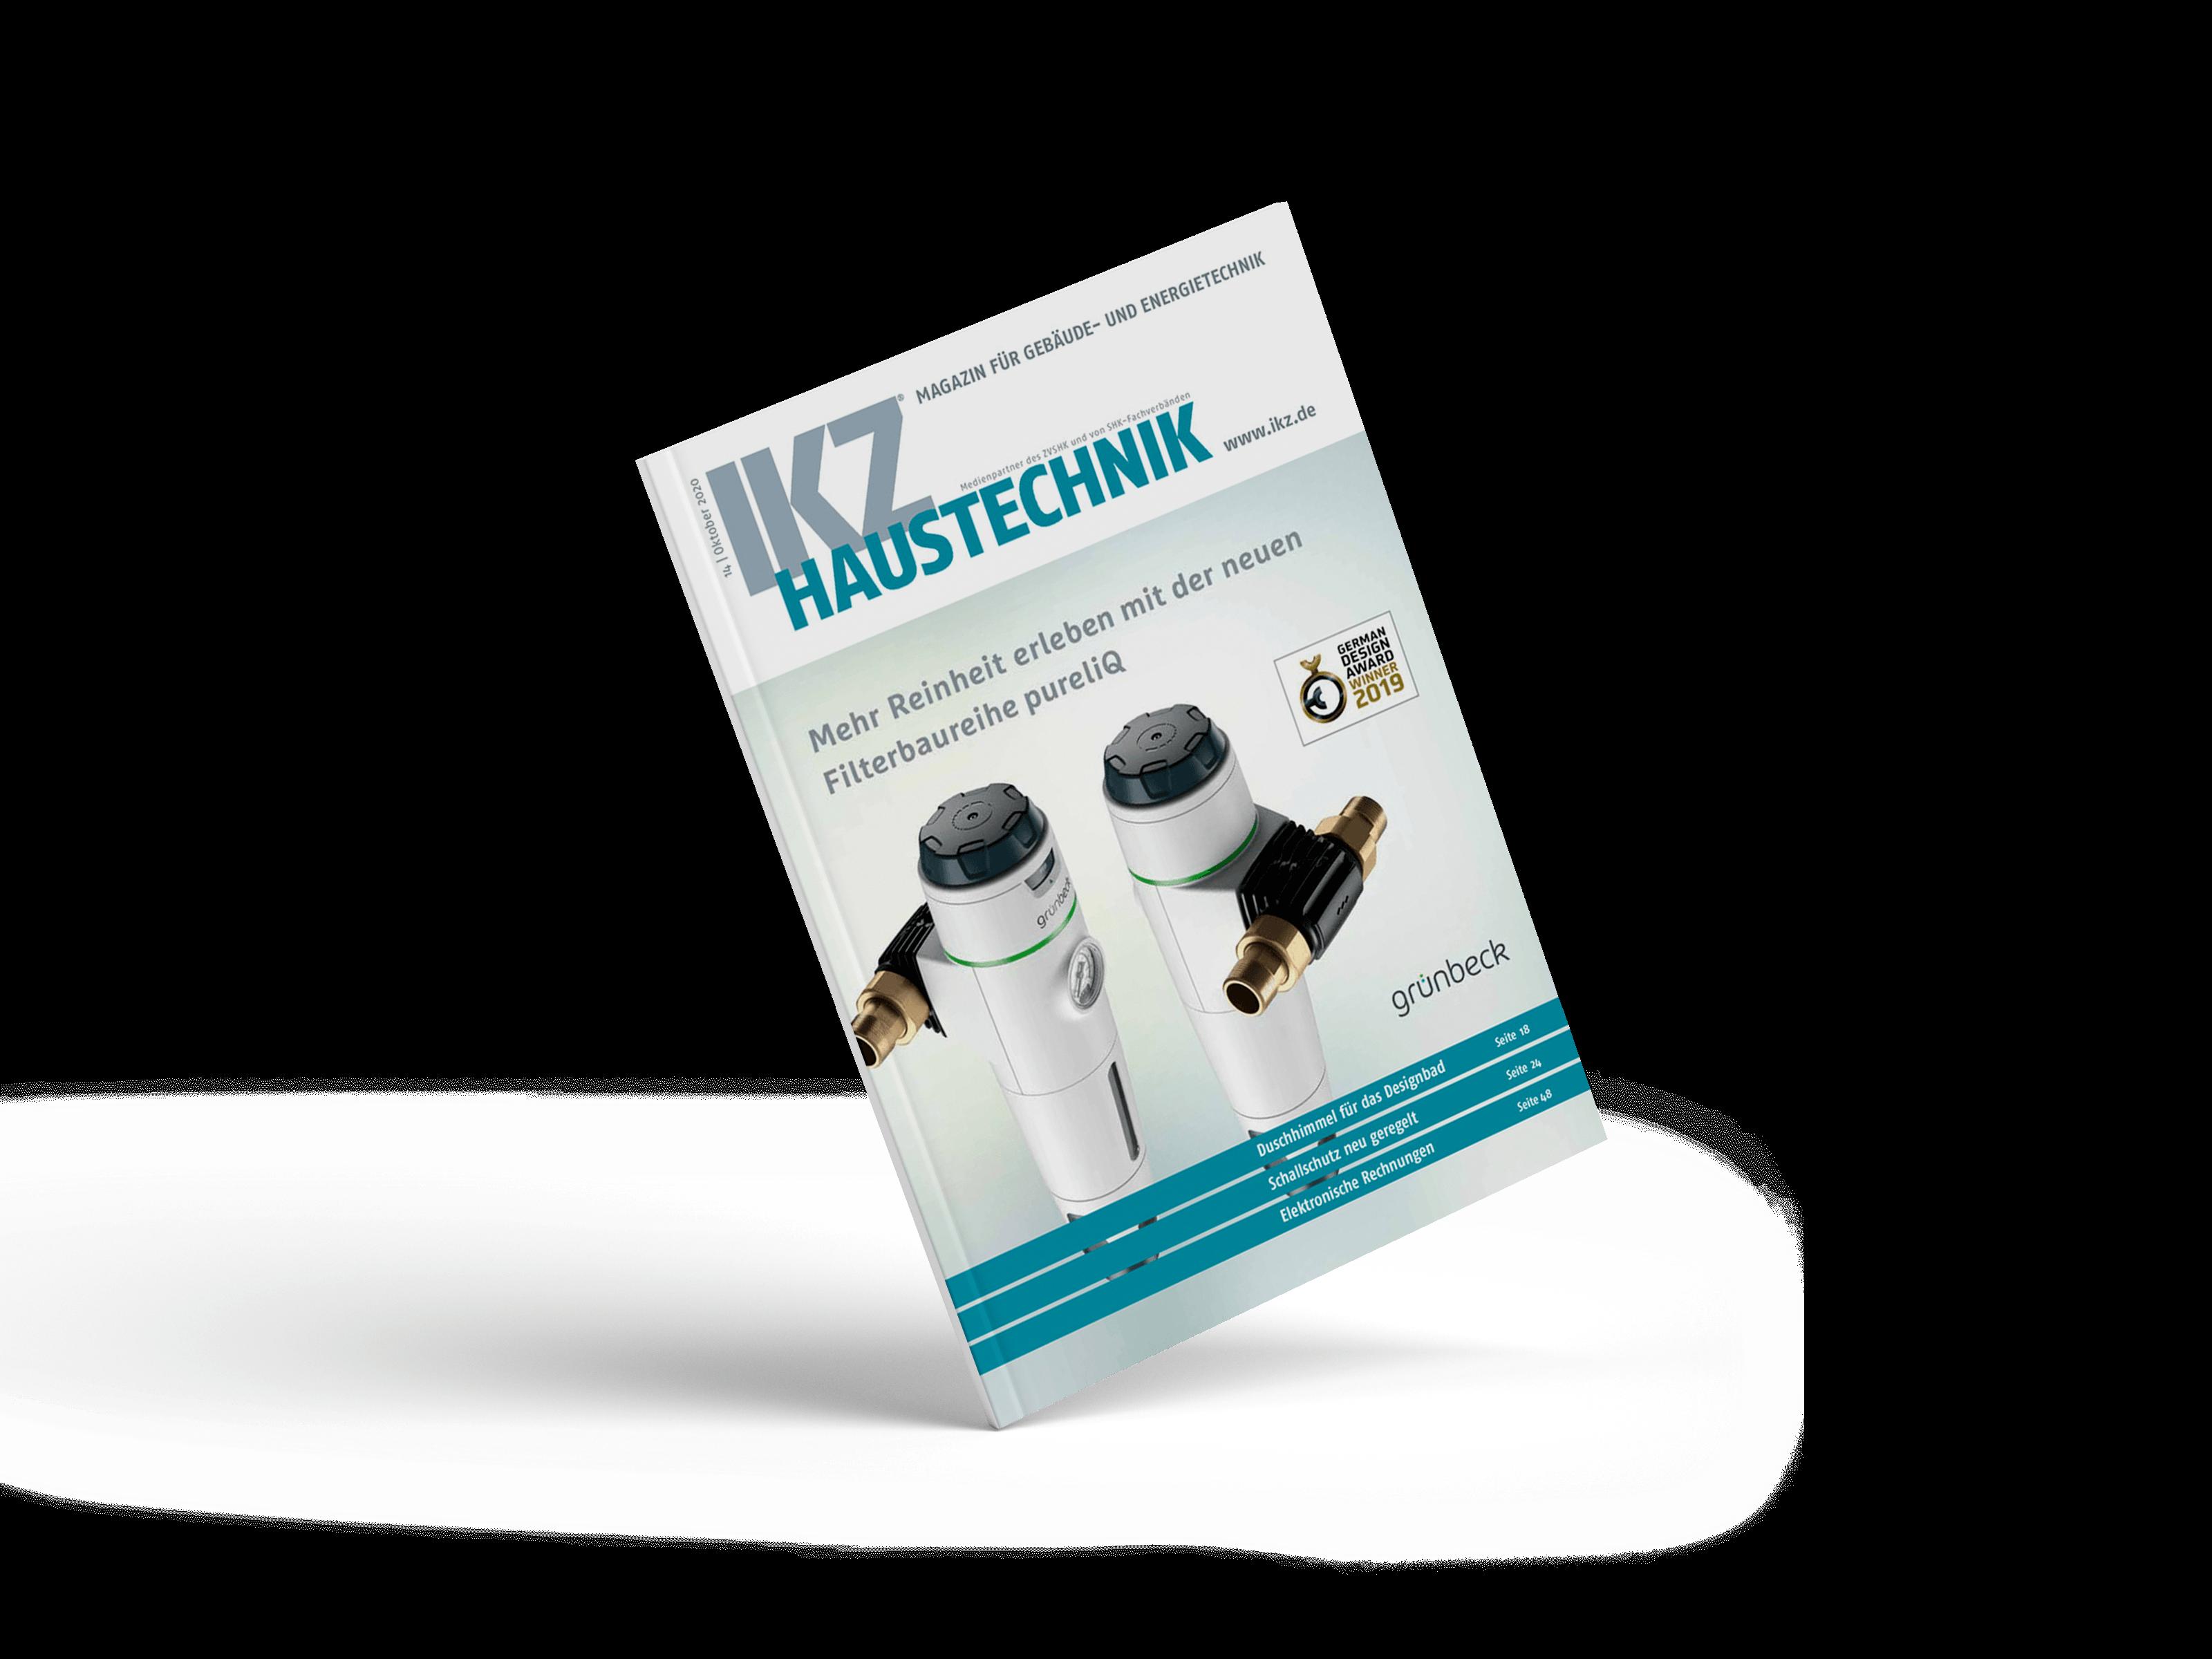 IKZ Haustechnik Candidate Flow GmbH